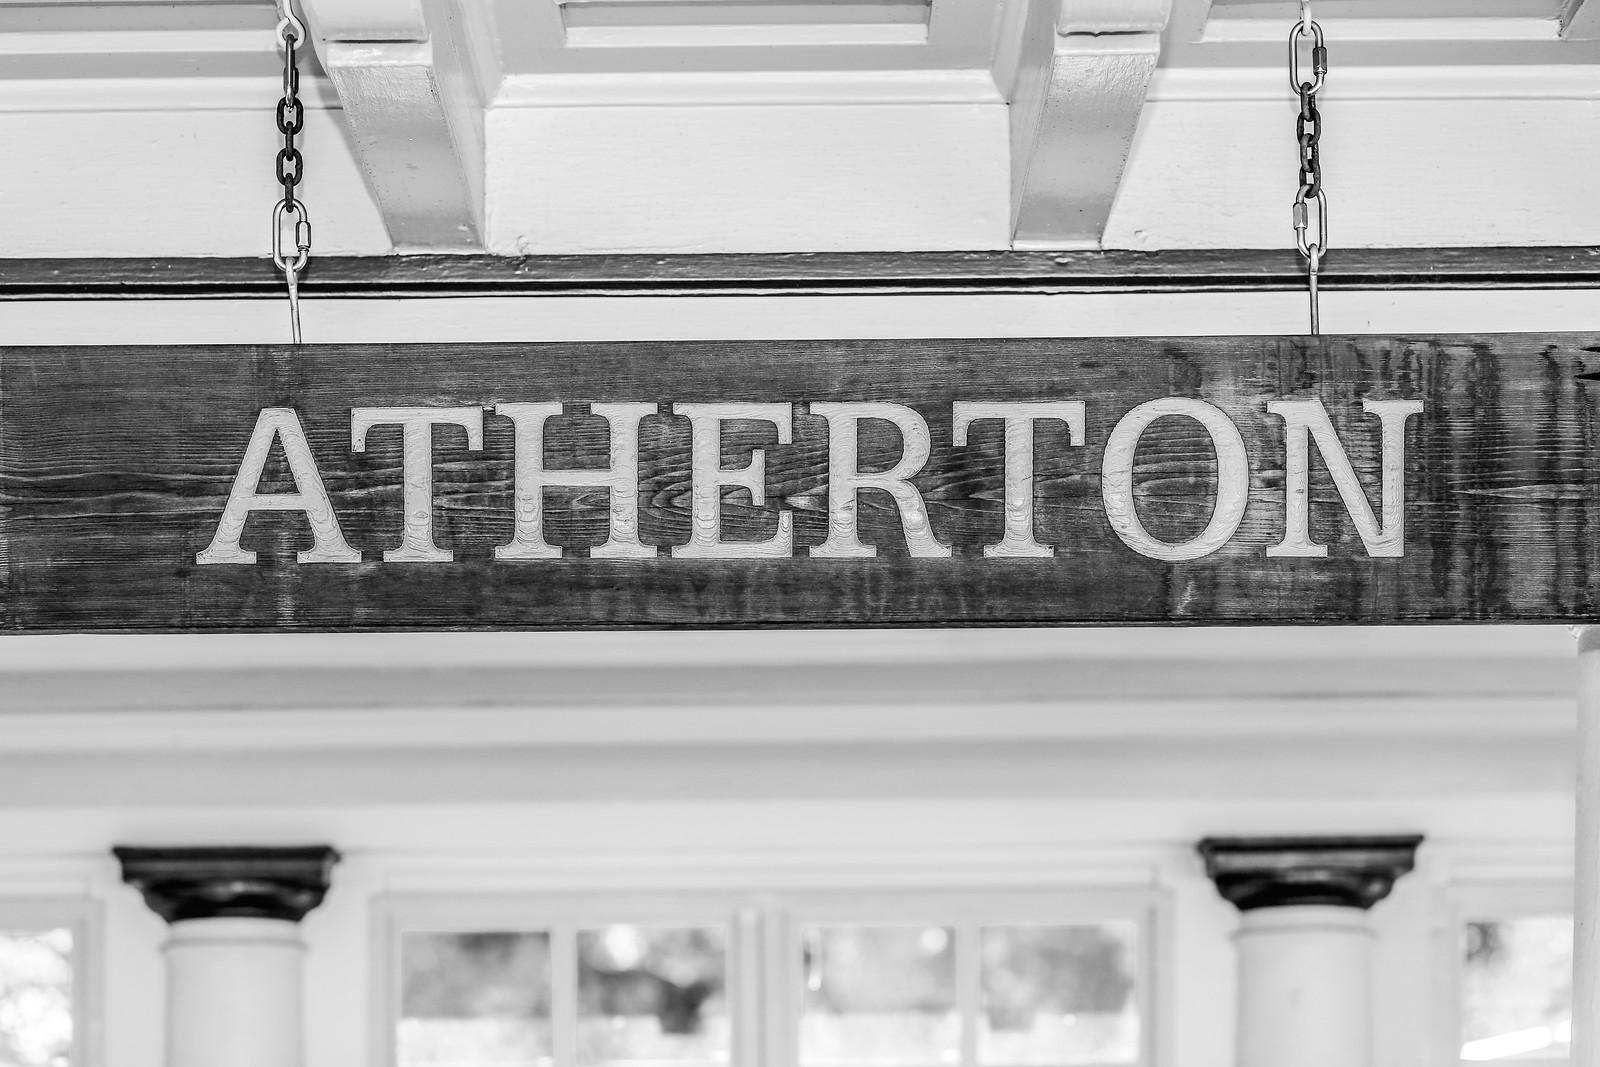 Town+of+Atherton+Blu+Skye+Media-7089-X3.jpg